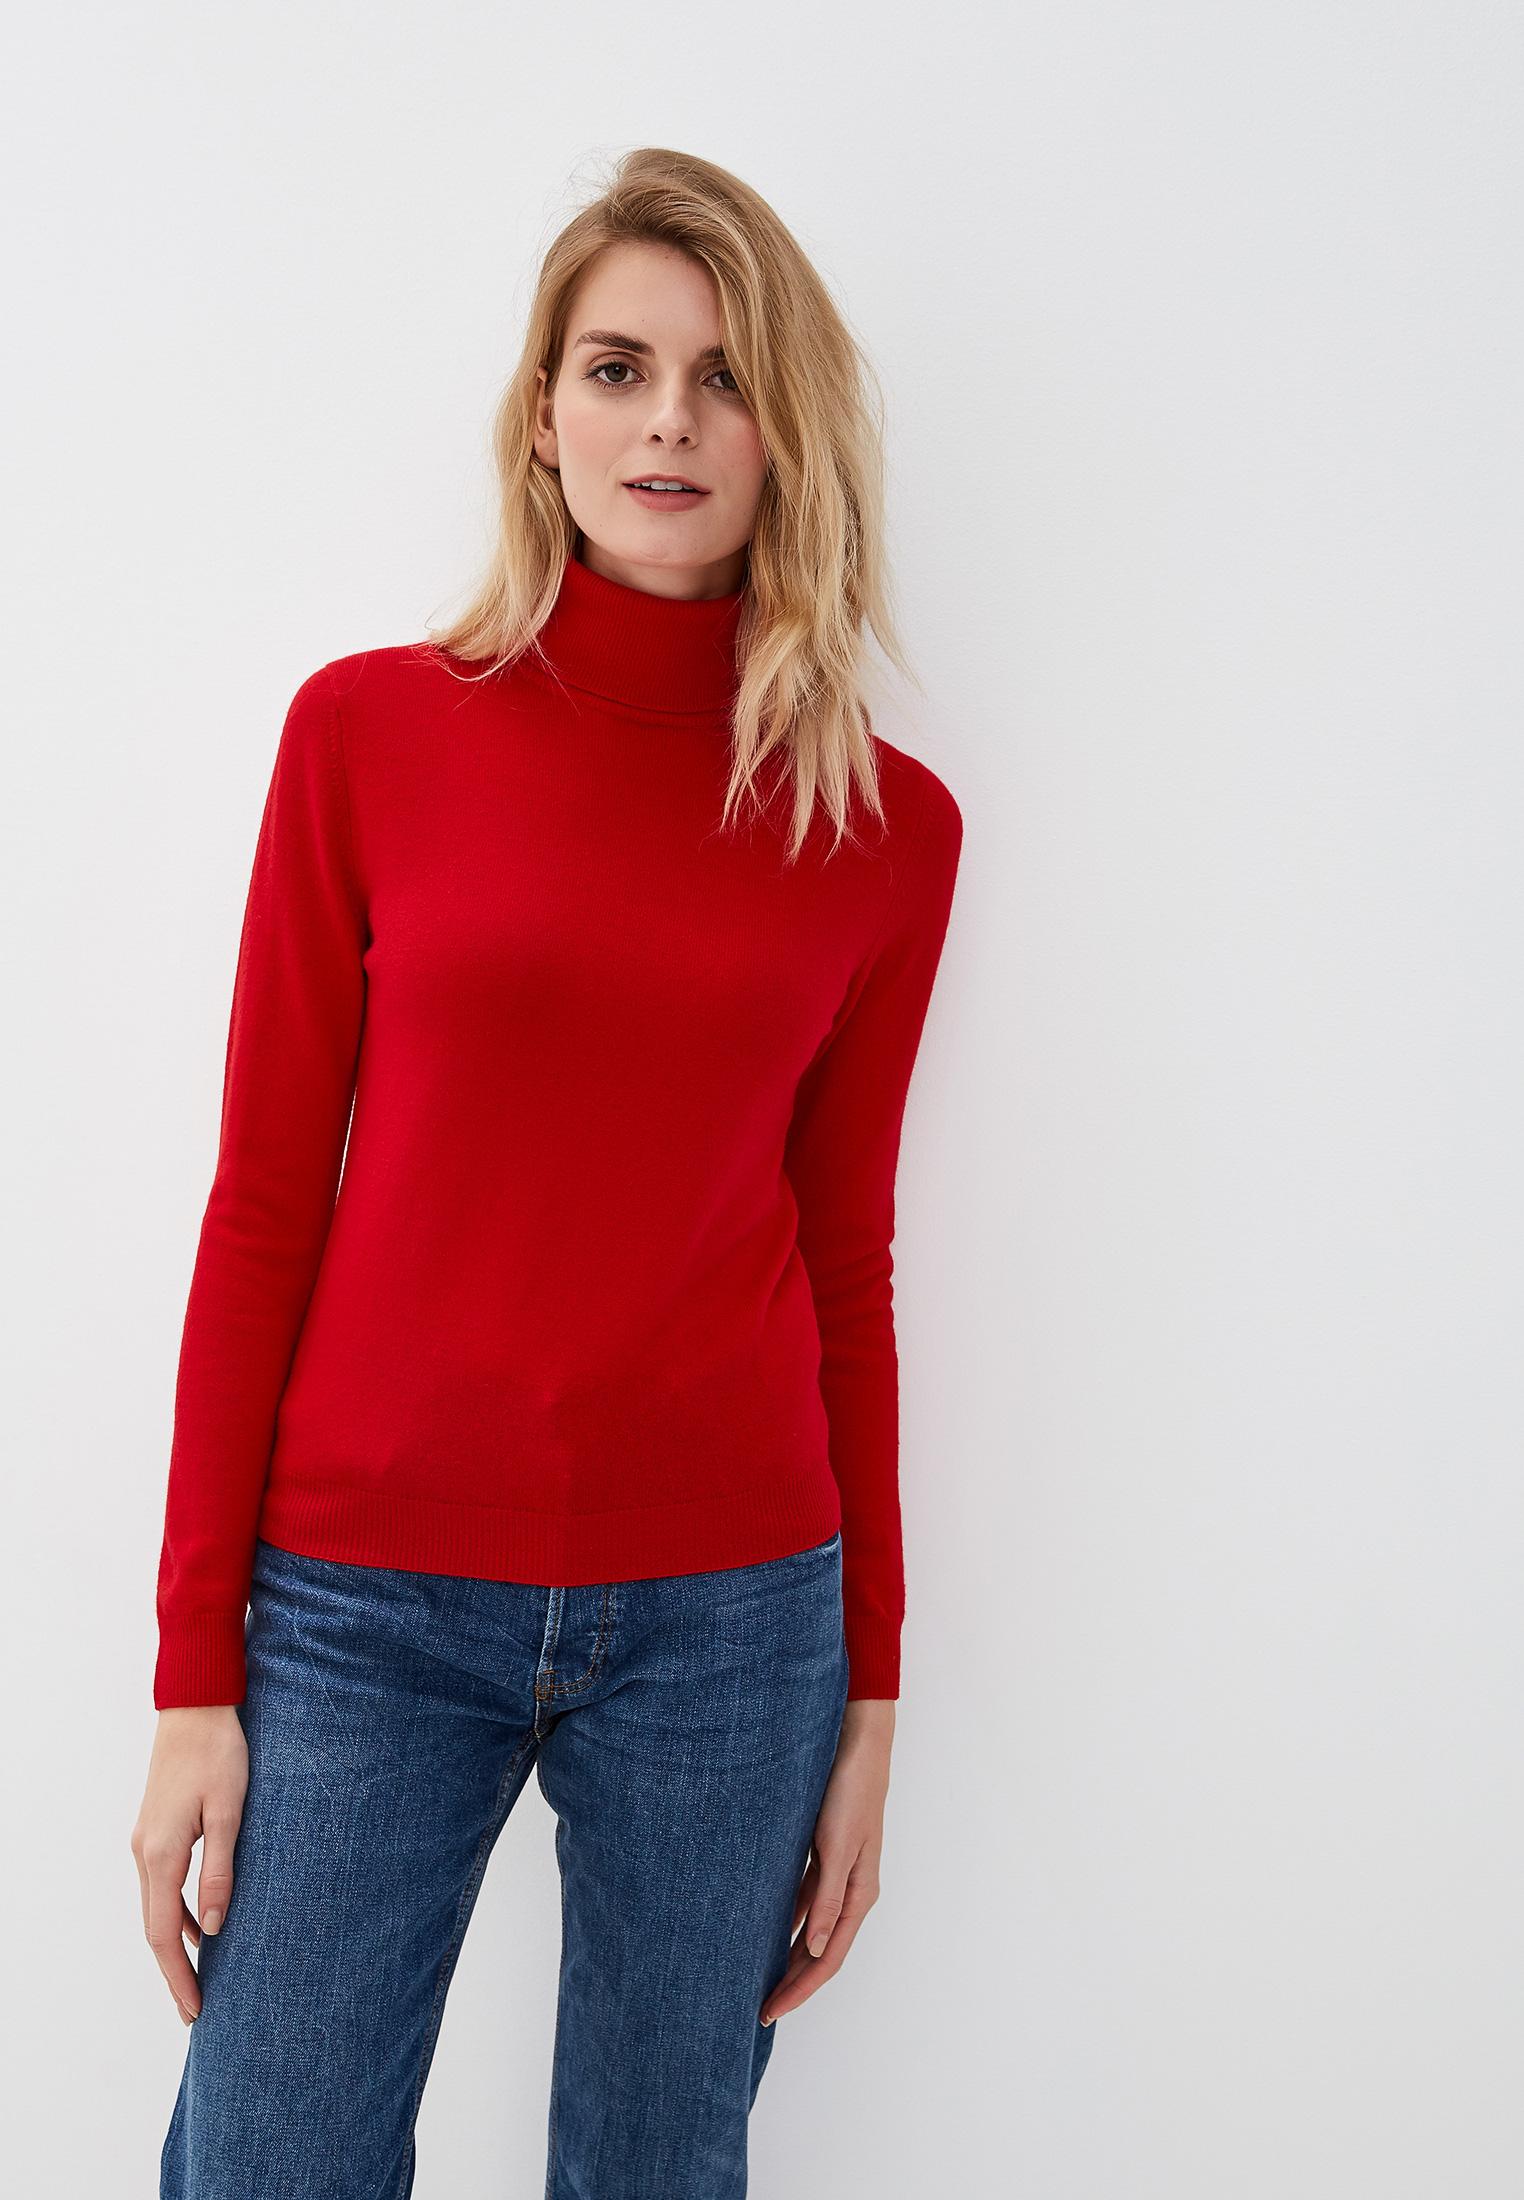 Водолазка, United Colors of Benetton, цвет: красный. Артикул: UN012EWFUYX8. Одежда / Джемперы, свитеры и кардиганы